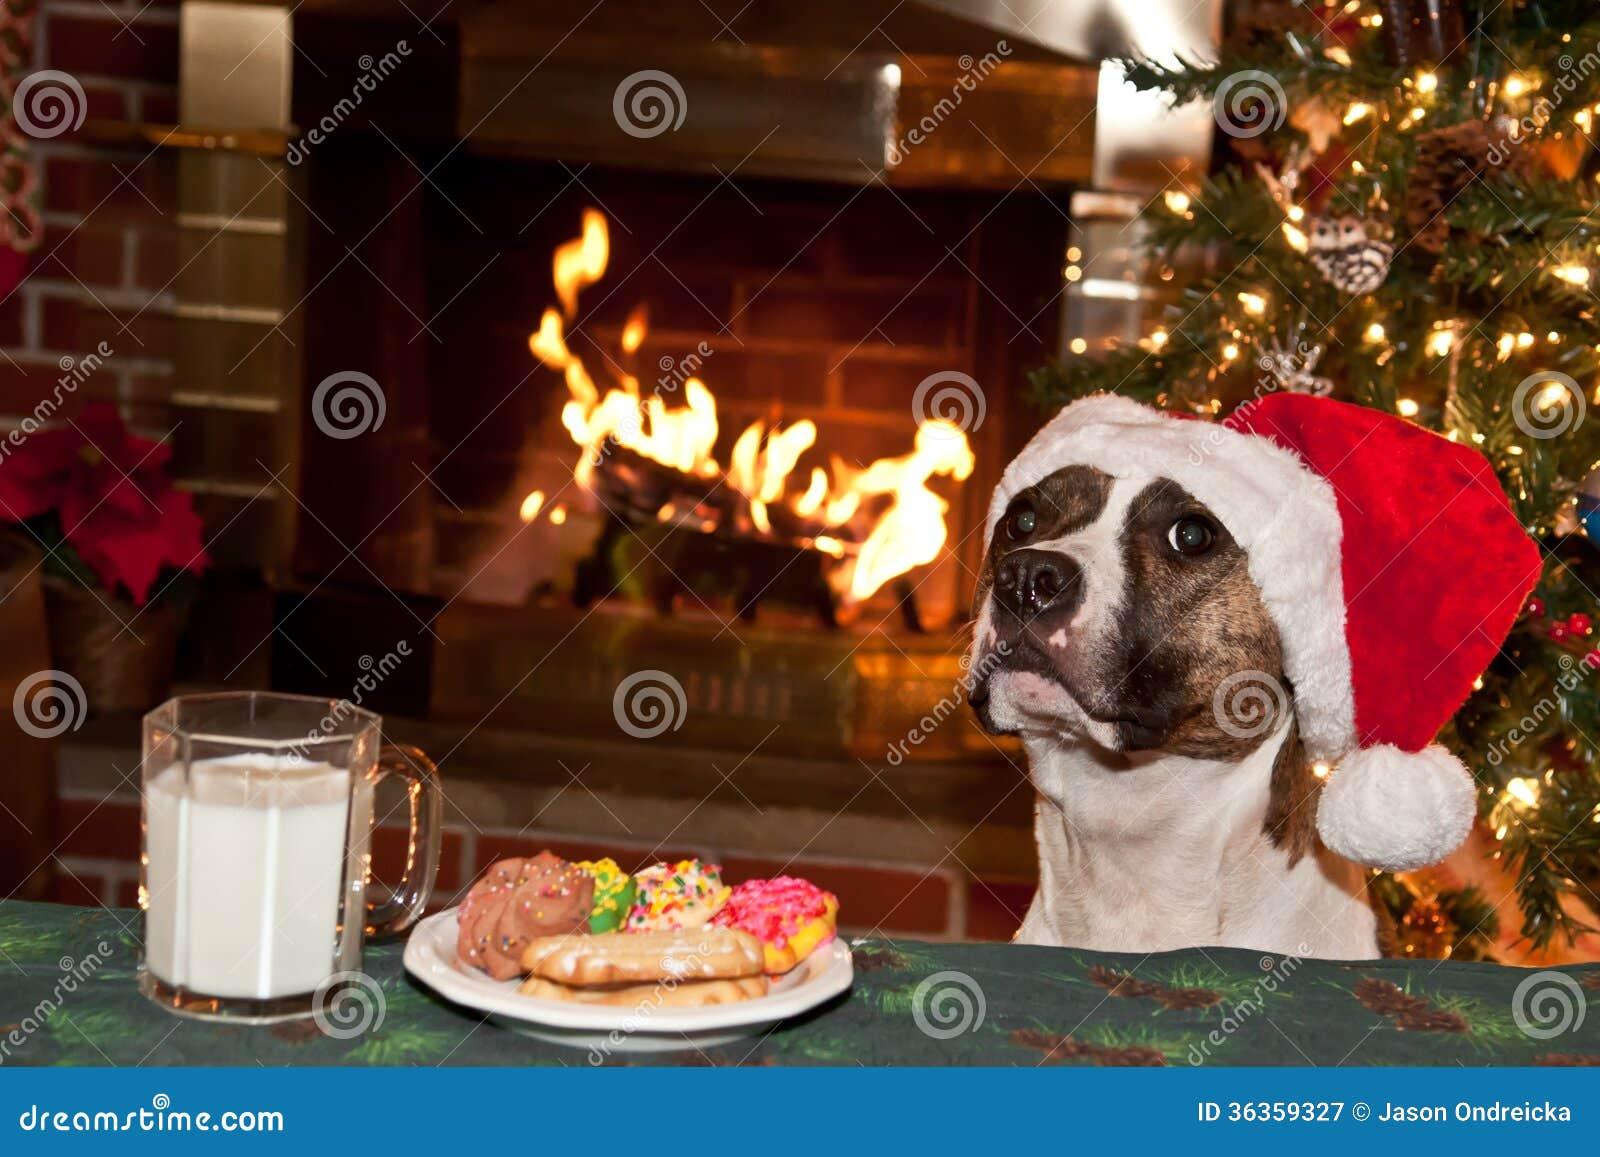 Dog Eats Santas Cookies. Royalty Free Stock Photography - Image ...